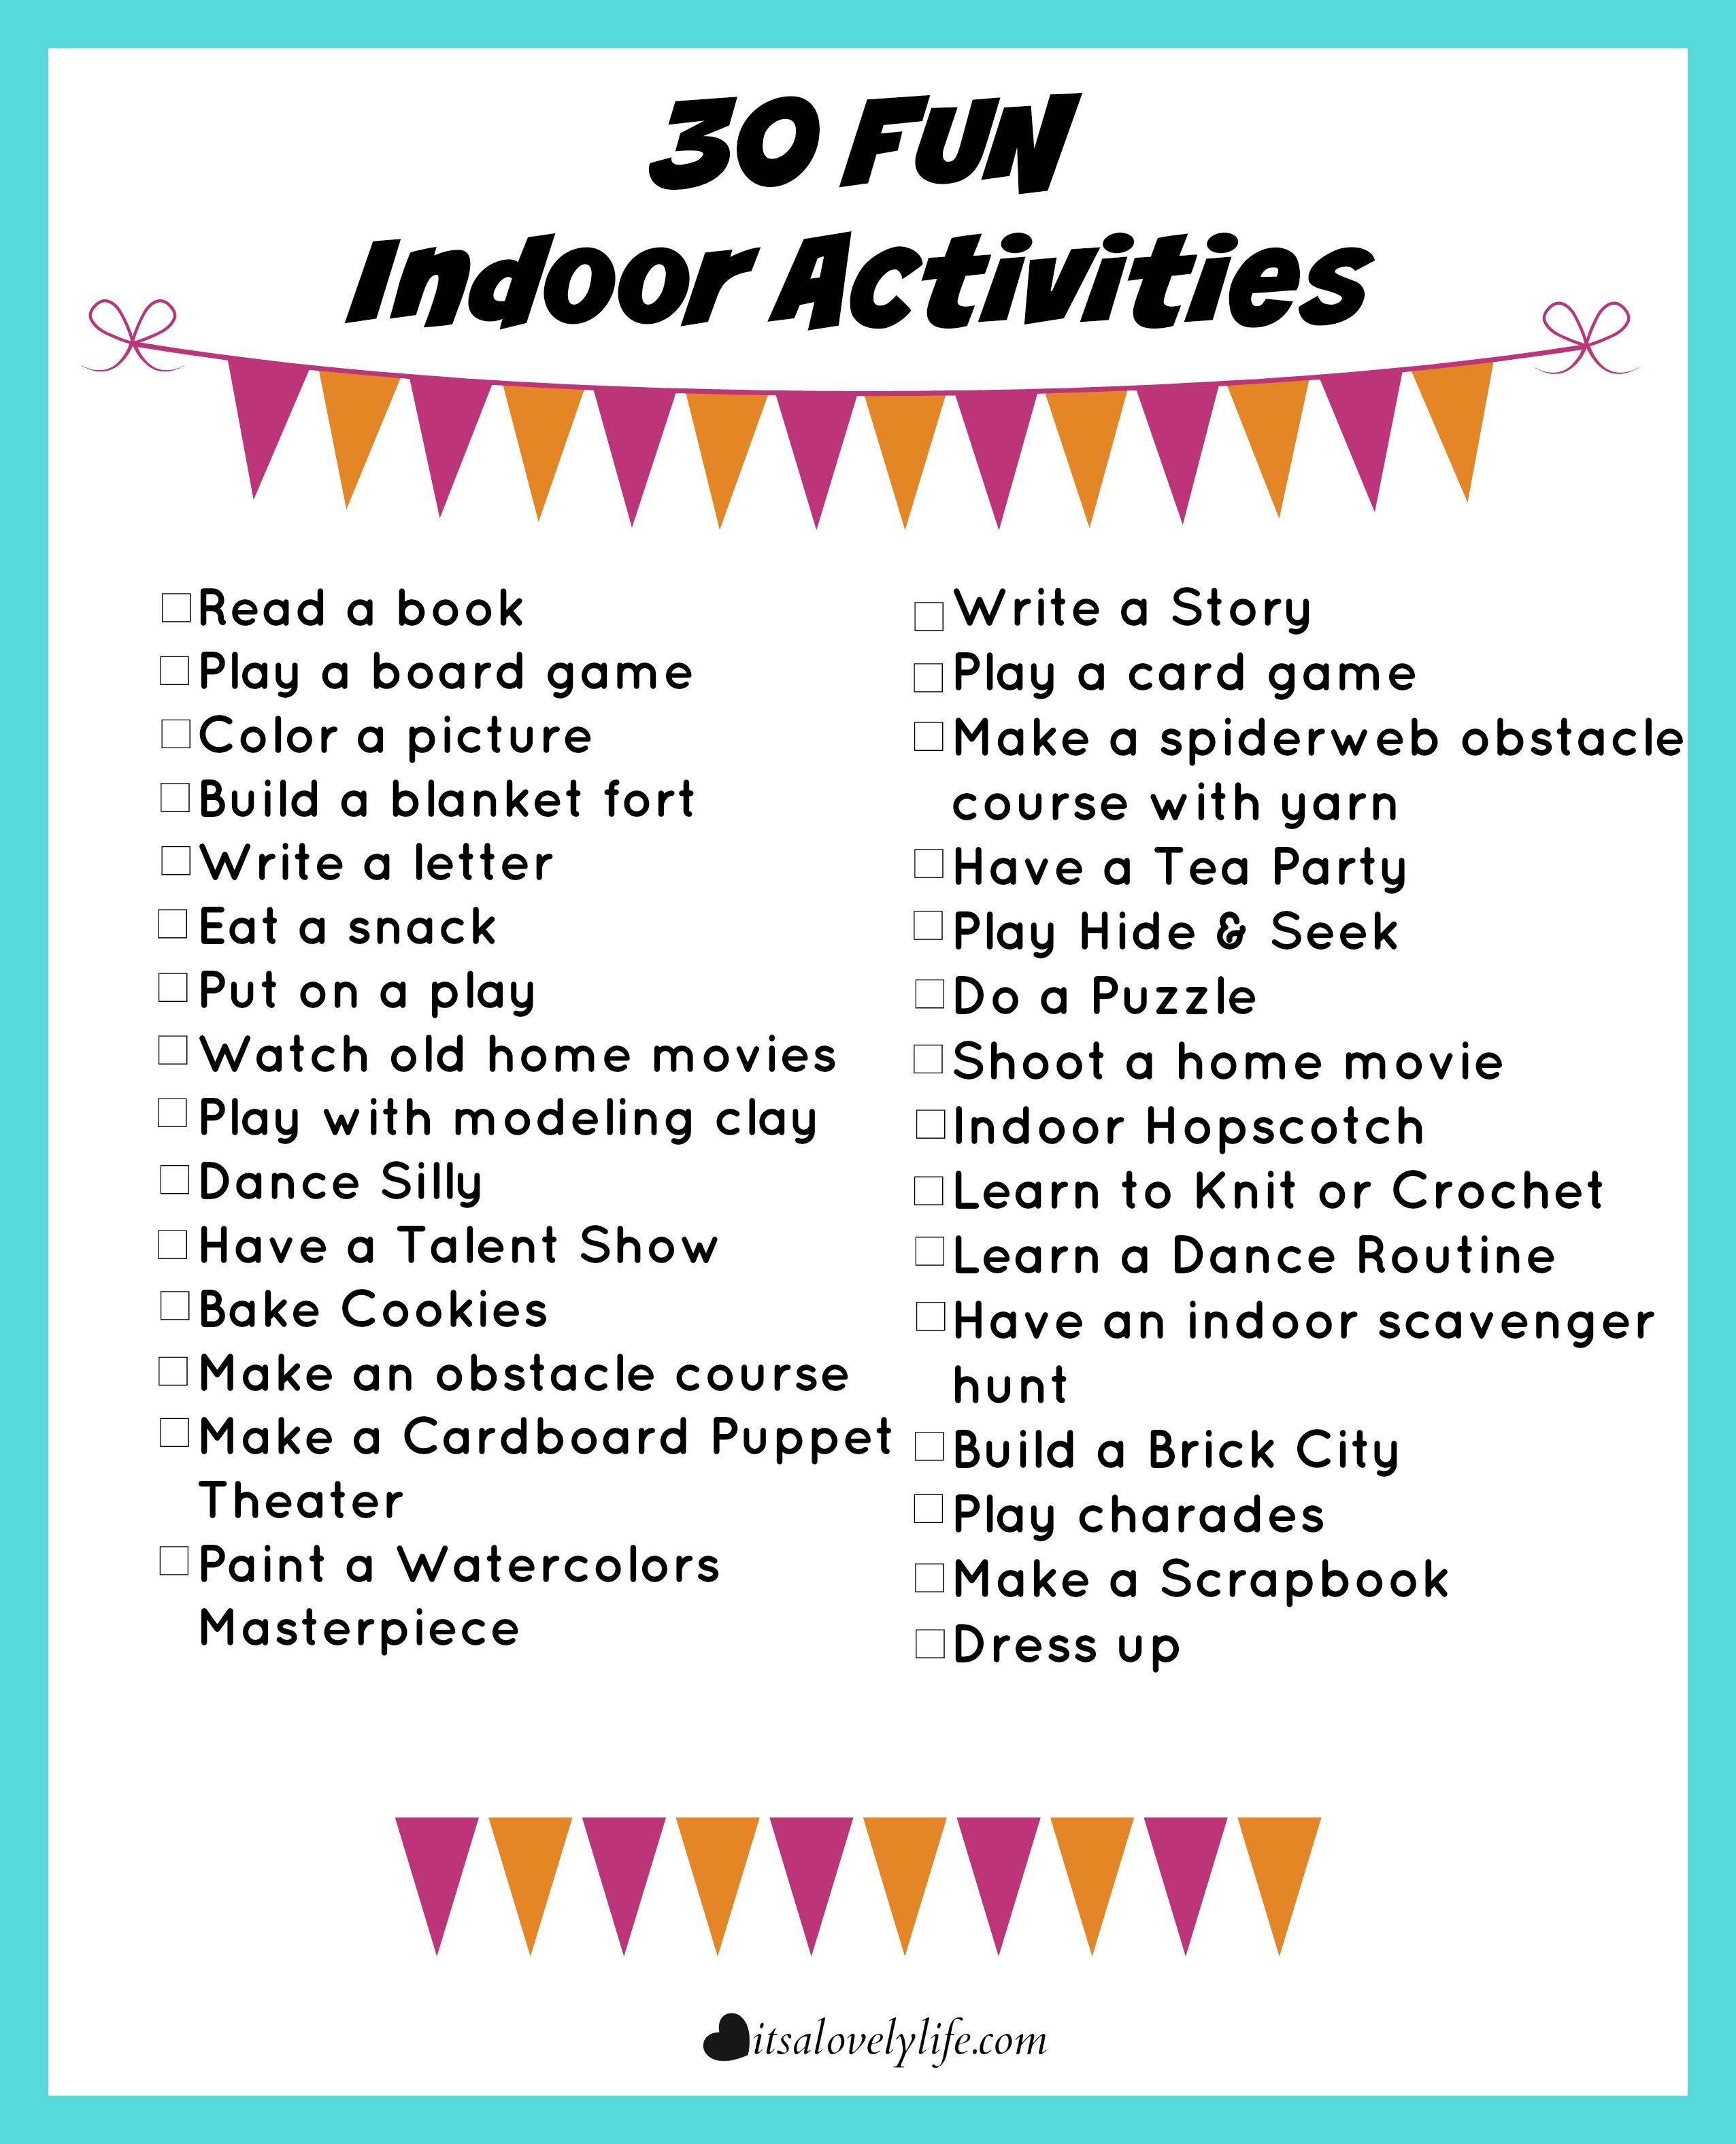 30 Fun Indoor Activities - It's a Lovely Life!